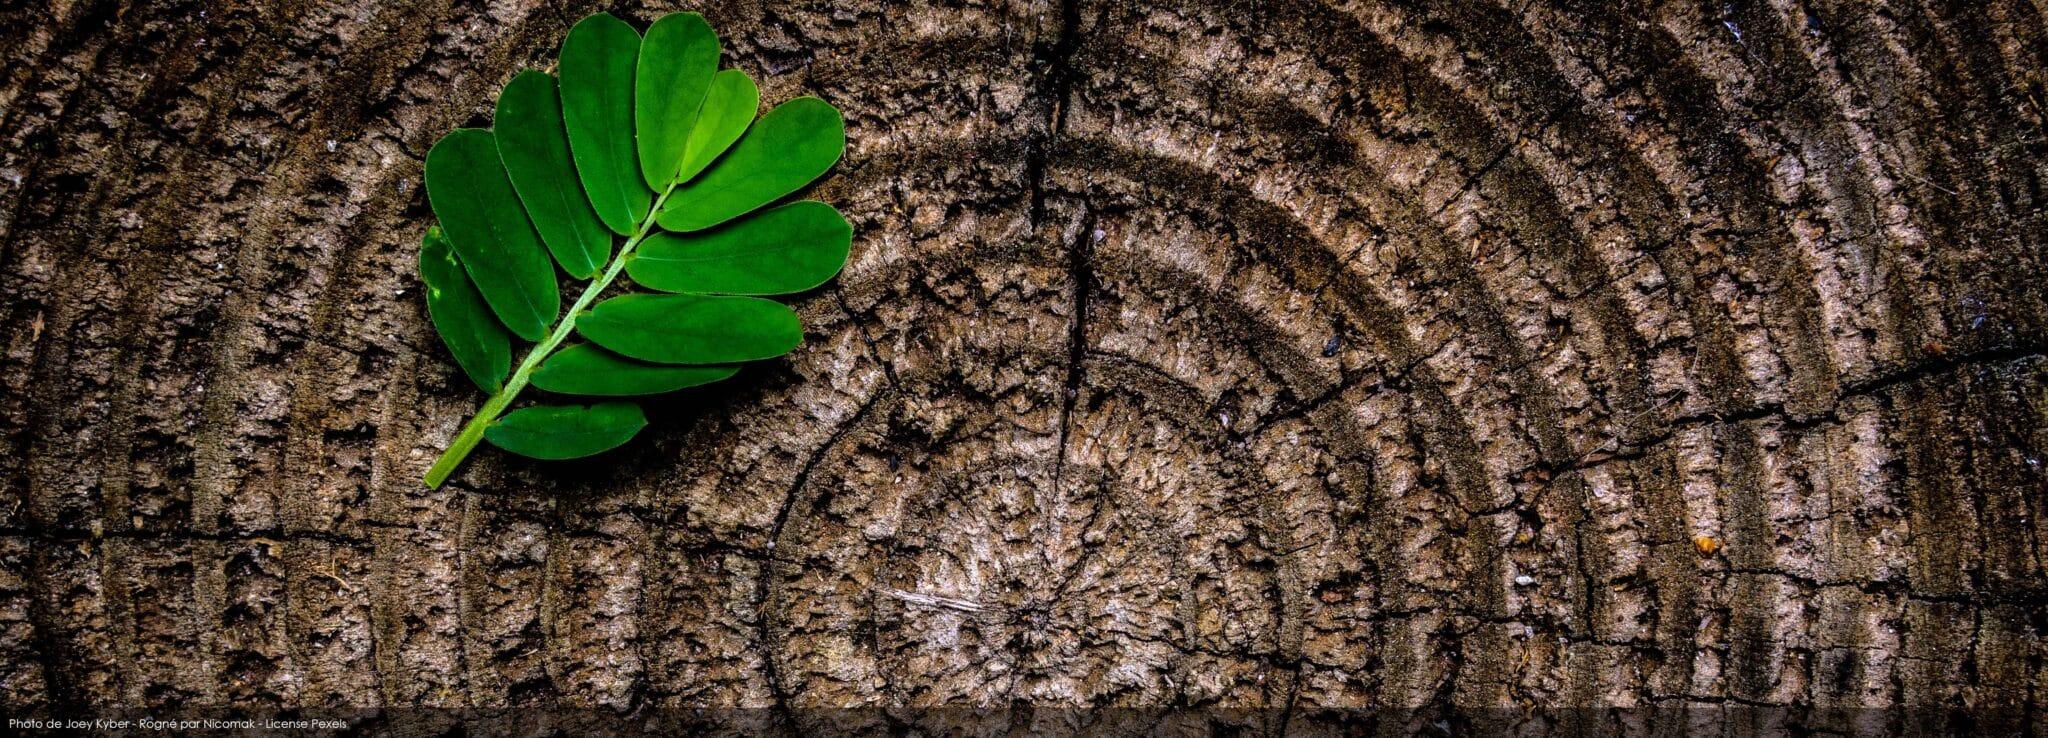 arbre ecologie